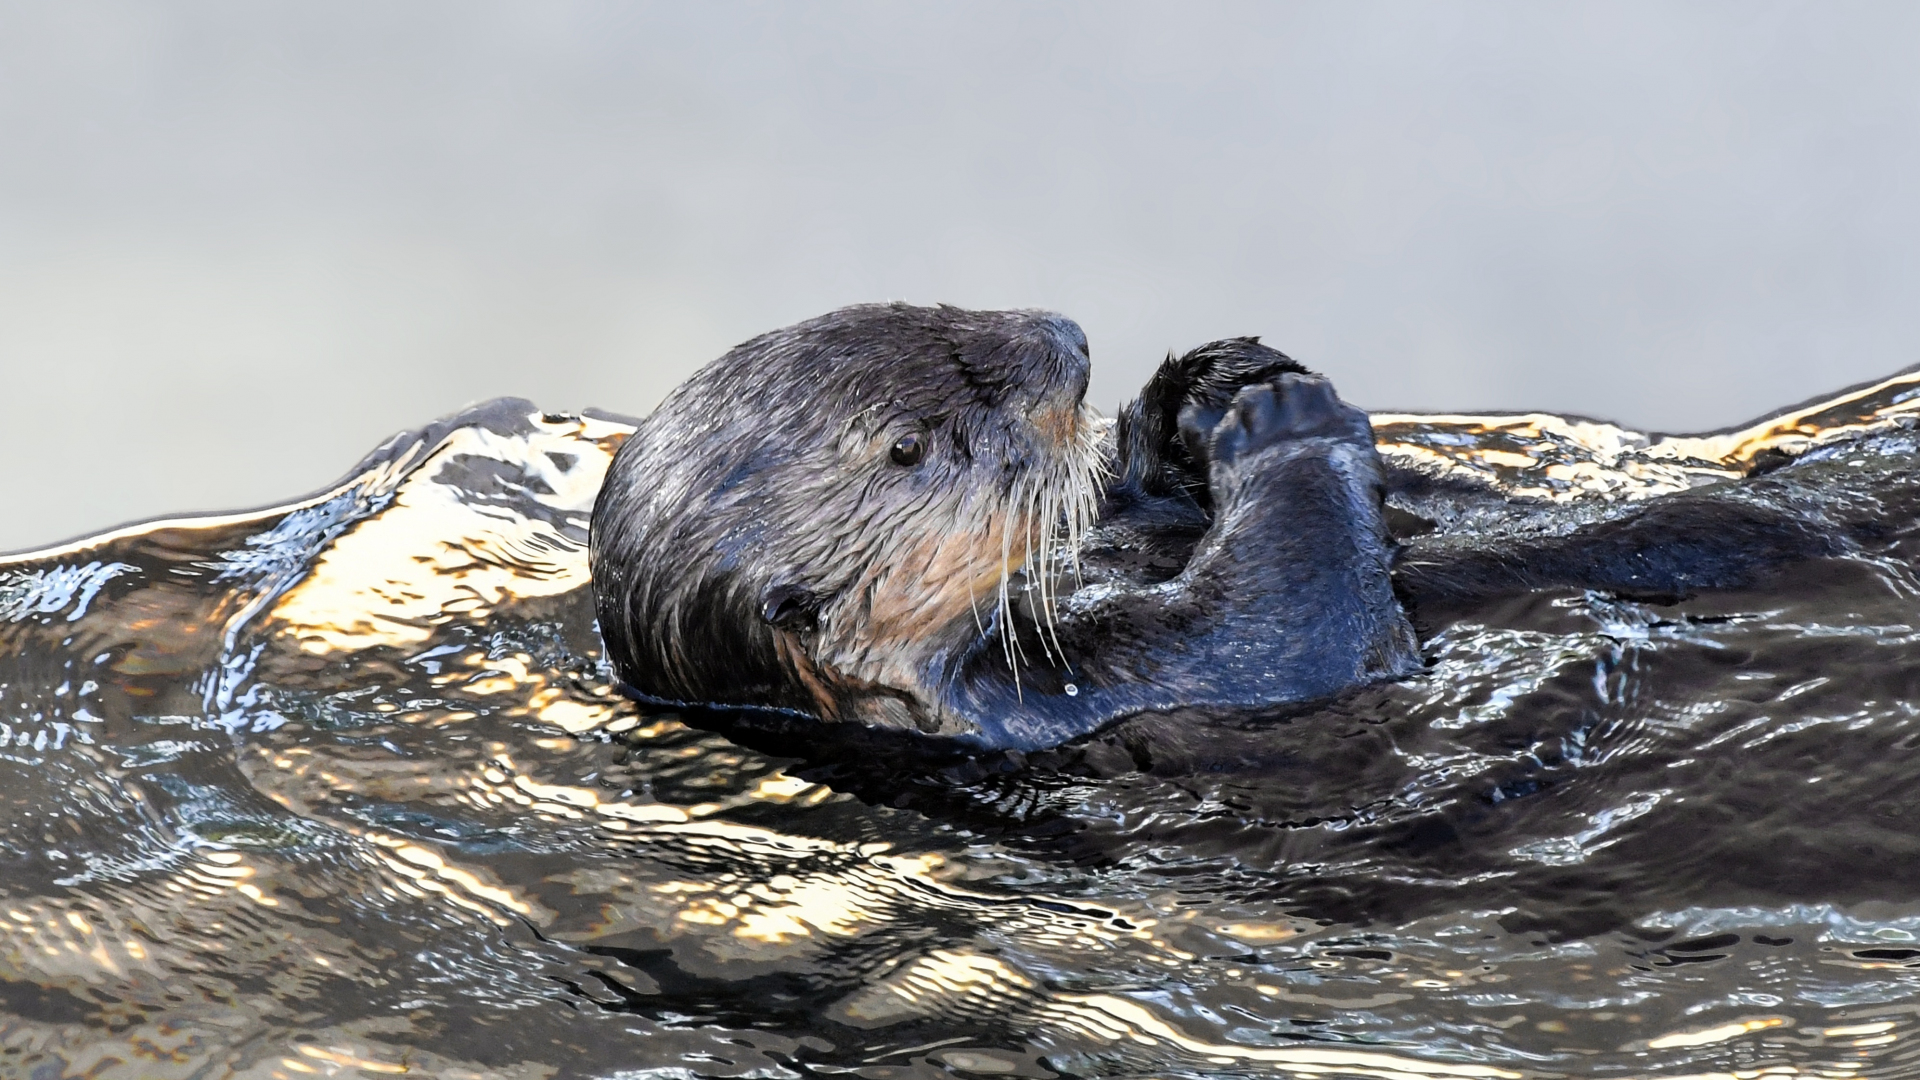 Download 1920x1080 Wallpaper Sea Otter Aquatic Animal Swim